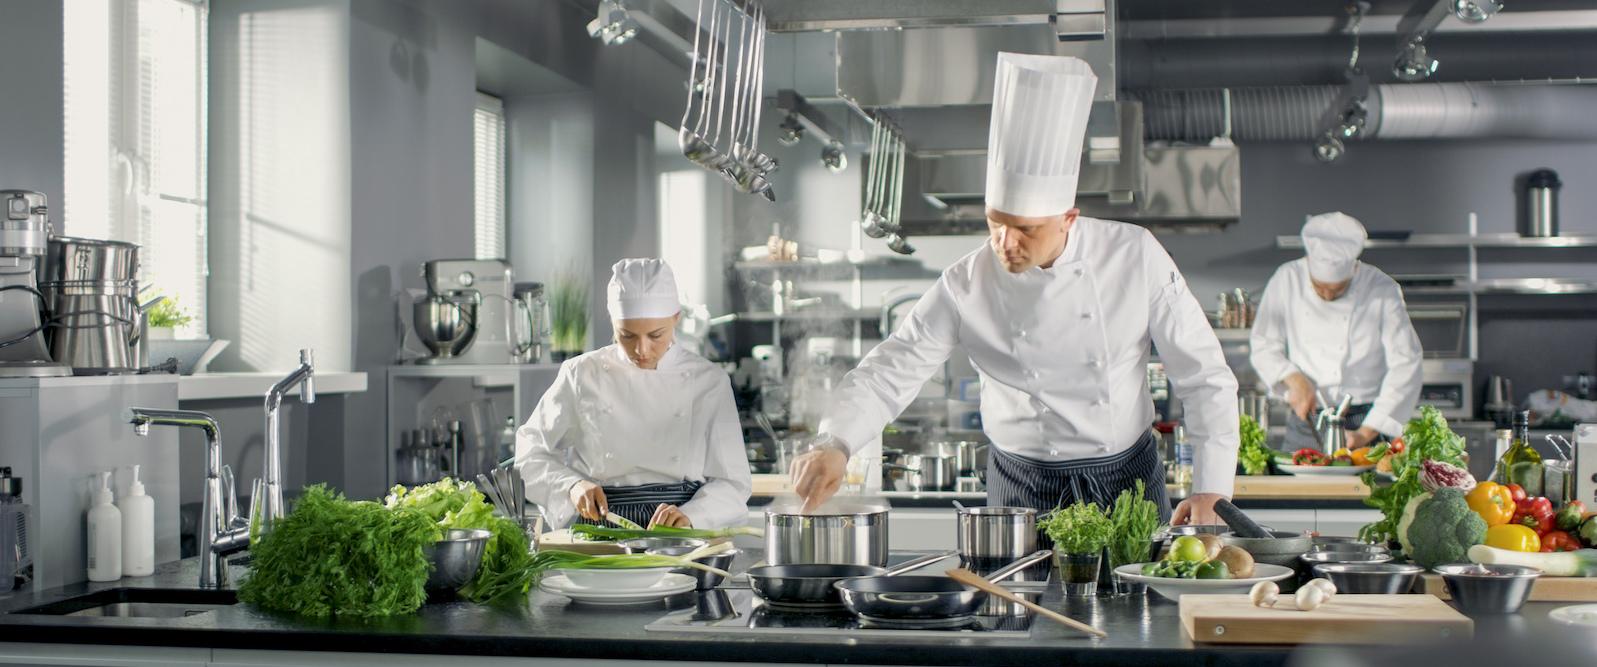 Vanguard Serves Restaurants